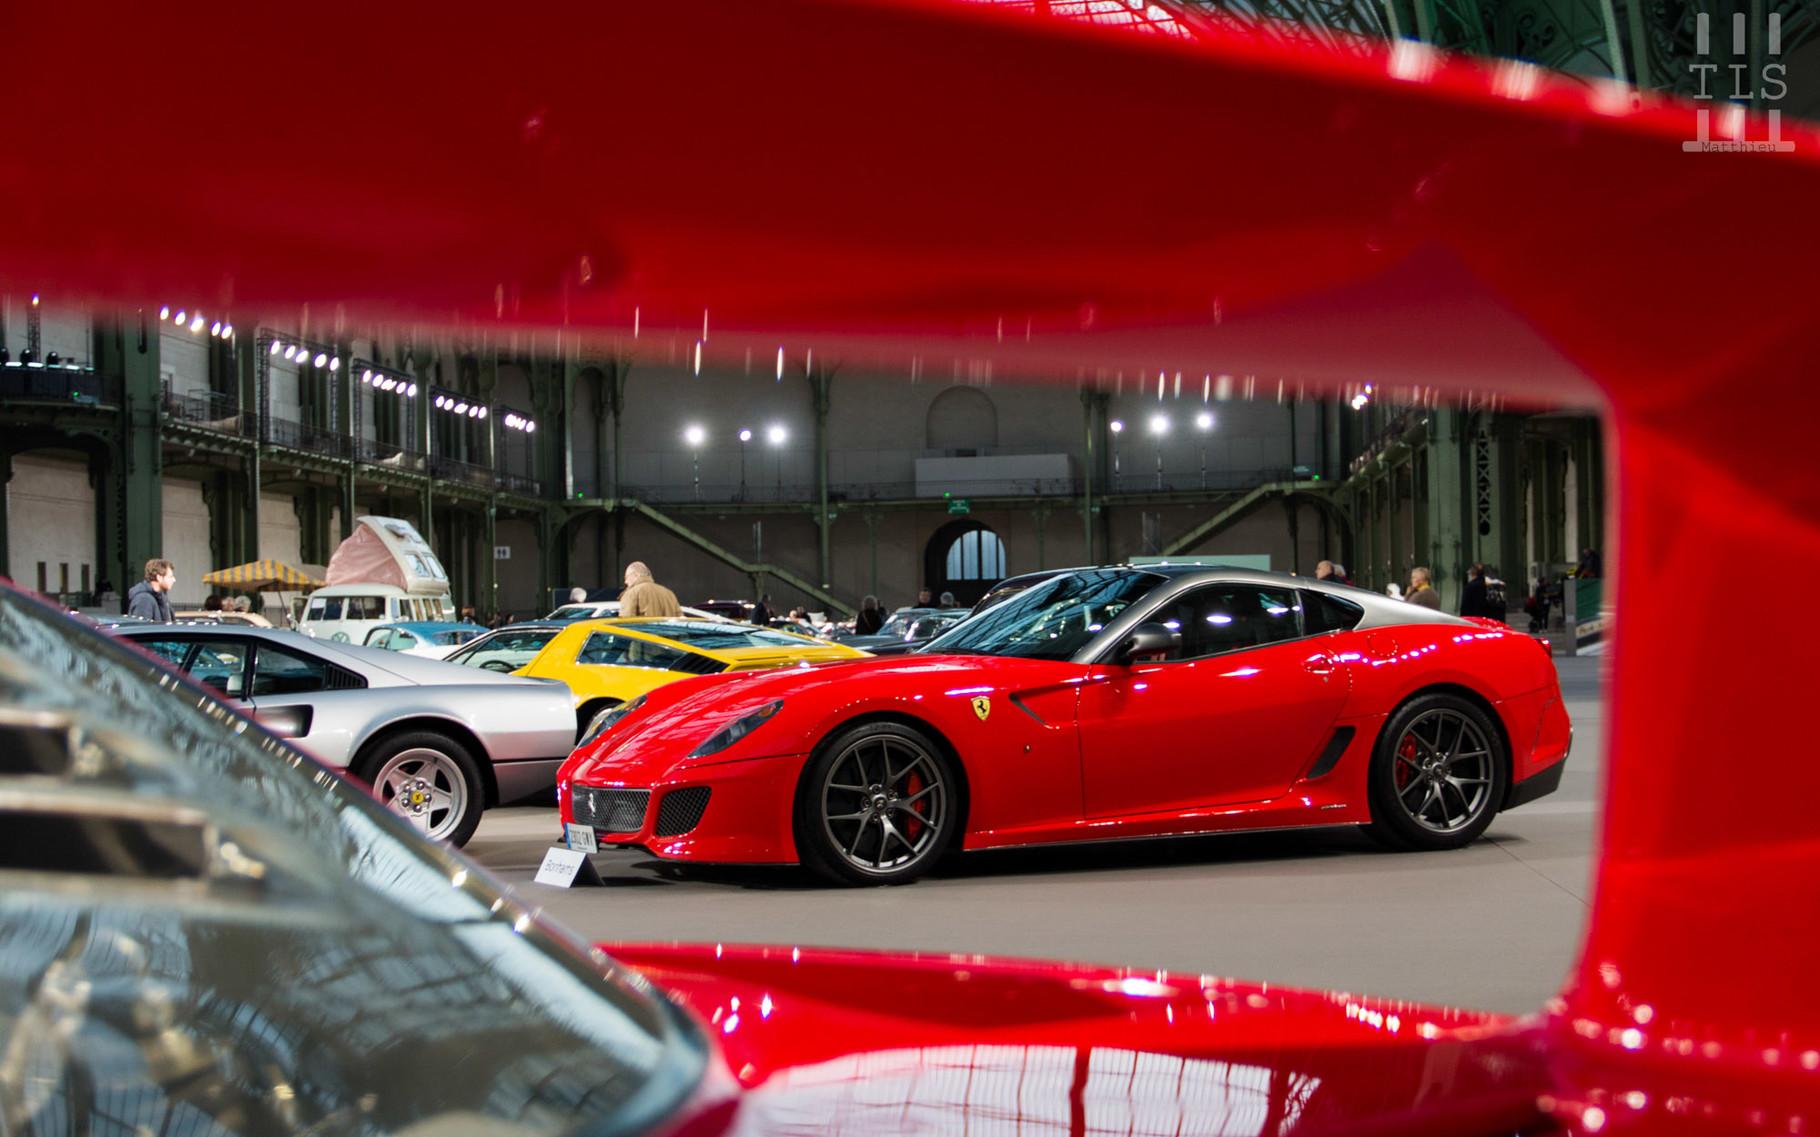 Ferrari 599 GTO, vendue à 425 500 euros.